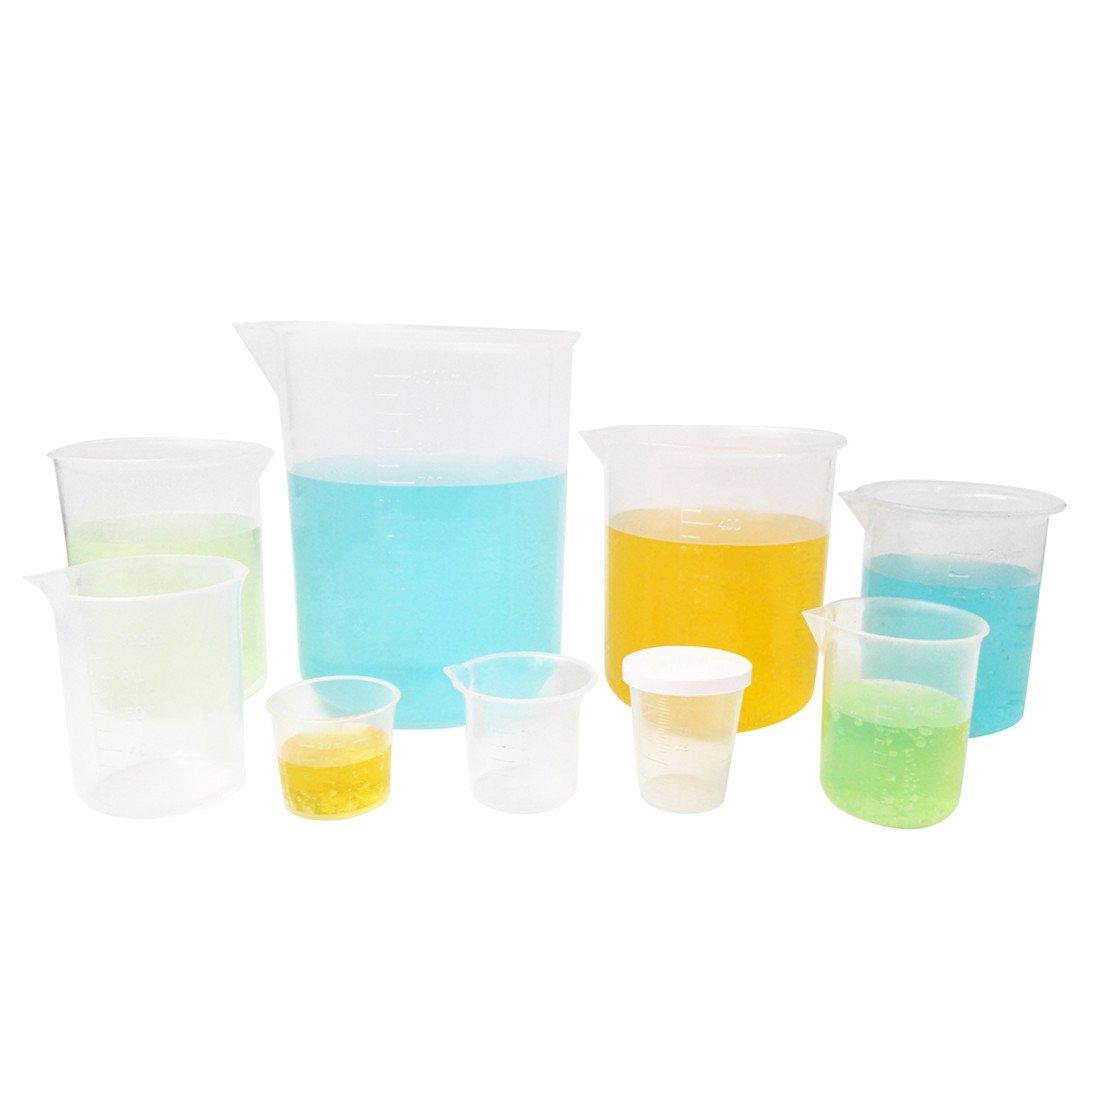 Kalevel 9pcs Plastic Beakers Measuring Cups with Spout Plastic Graduation Cups Graduated Cups Plastic Beaker Measuring Beaker for Liquid Measuring Tools Polypropylene Measuring Cup (200ml-1000ml)